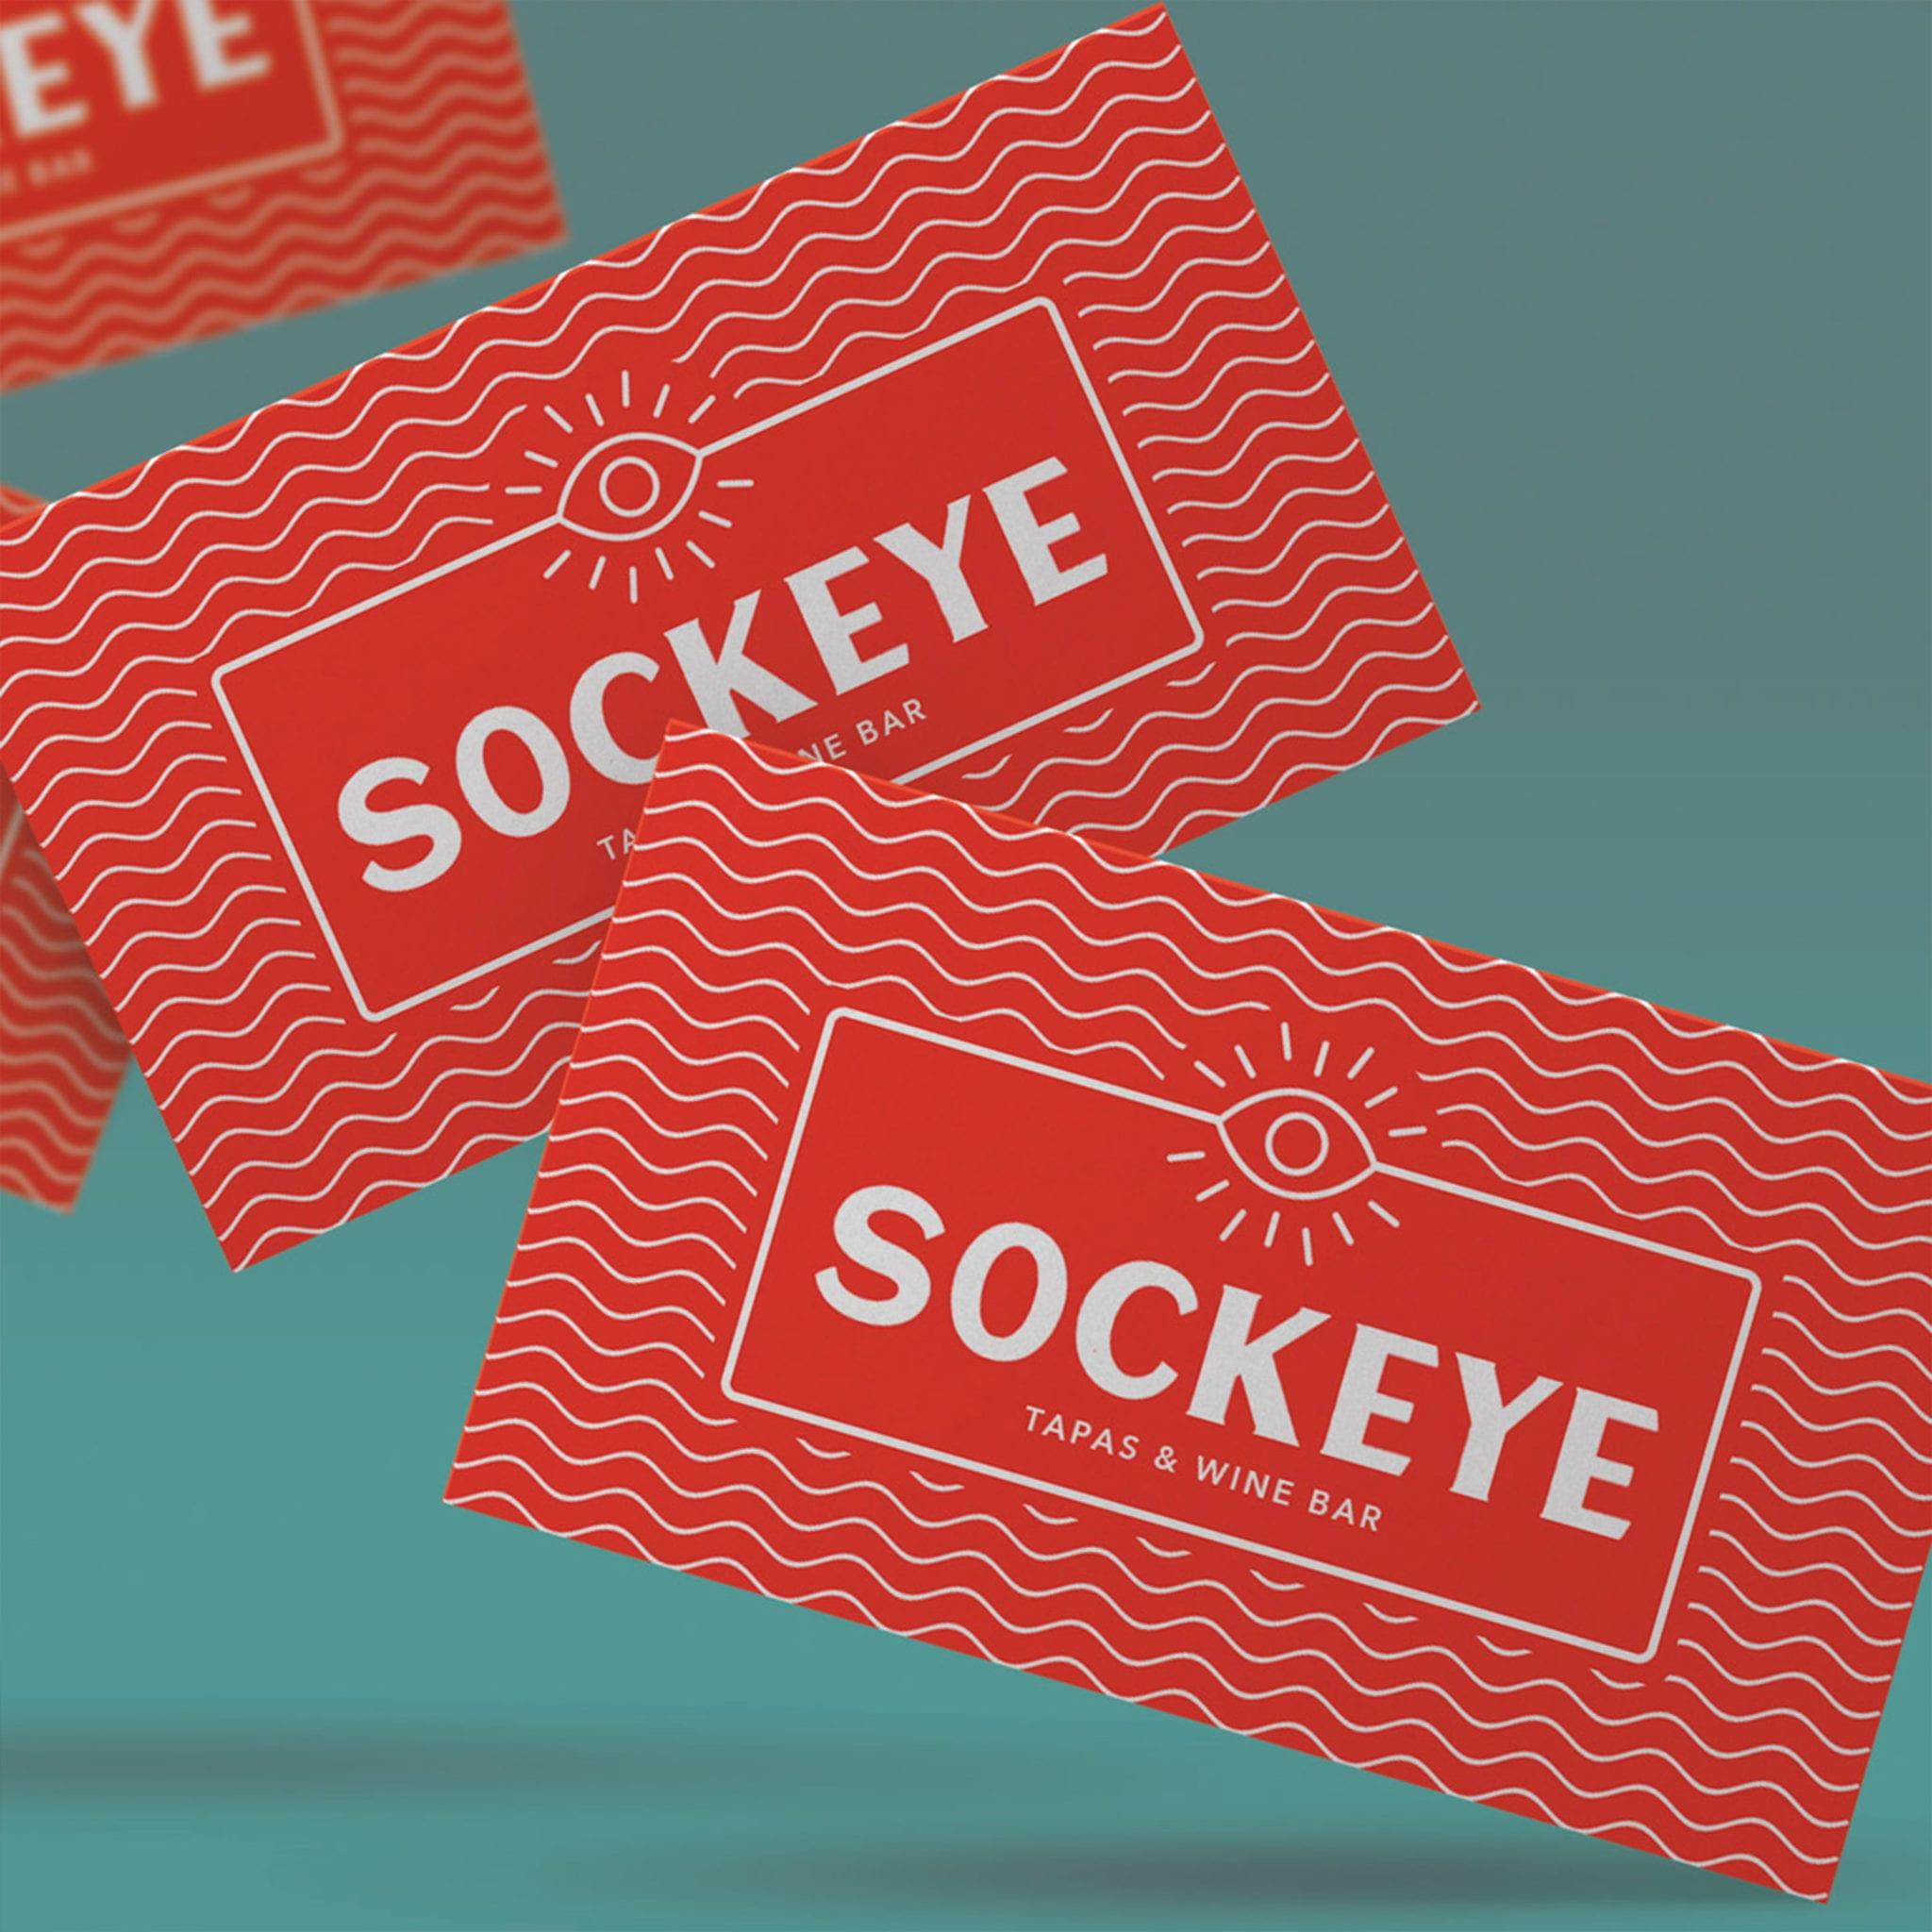 SOCKEYE BUSINESS CARD MOCKUP